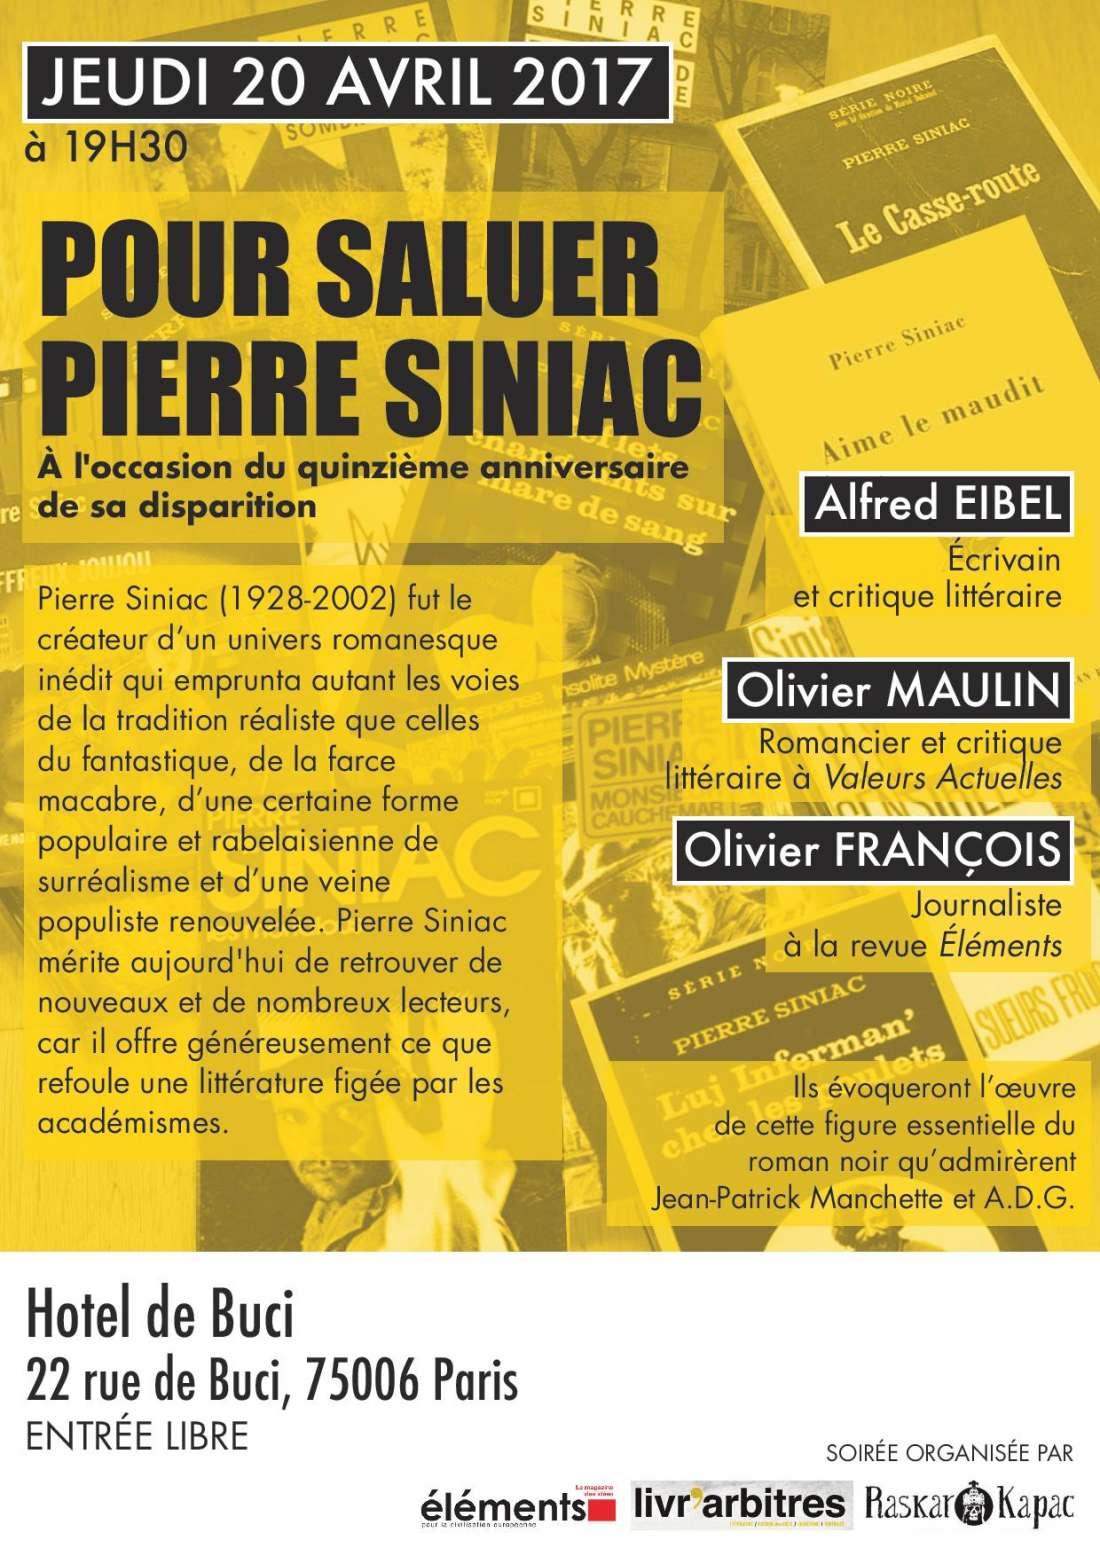 Pierre Siniac